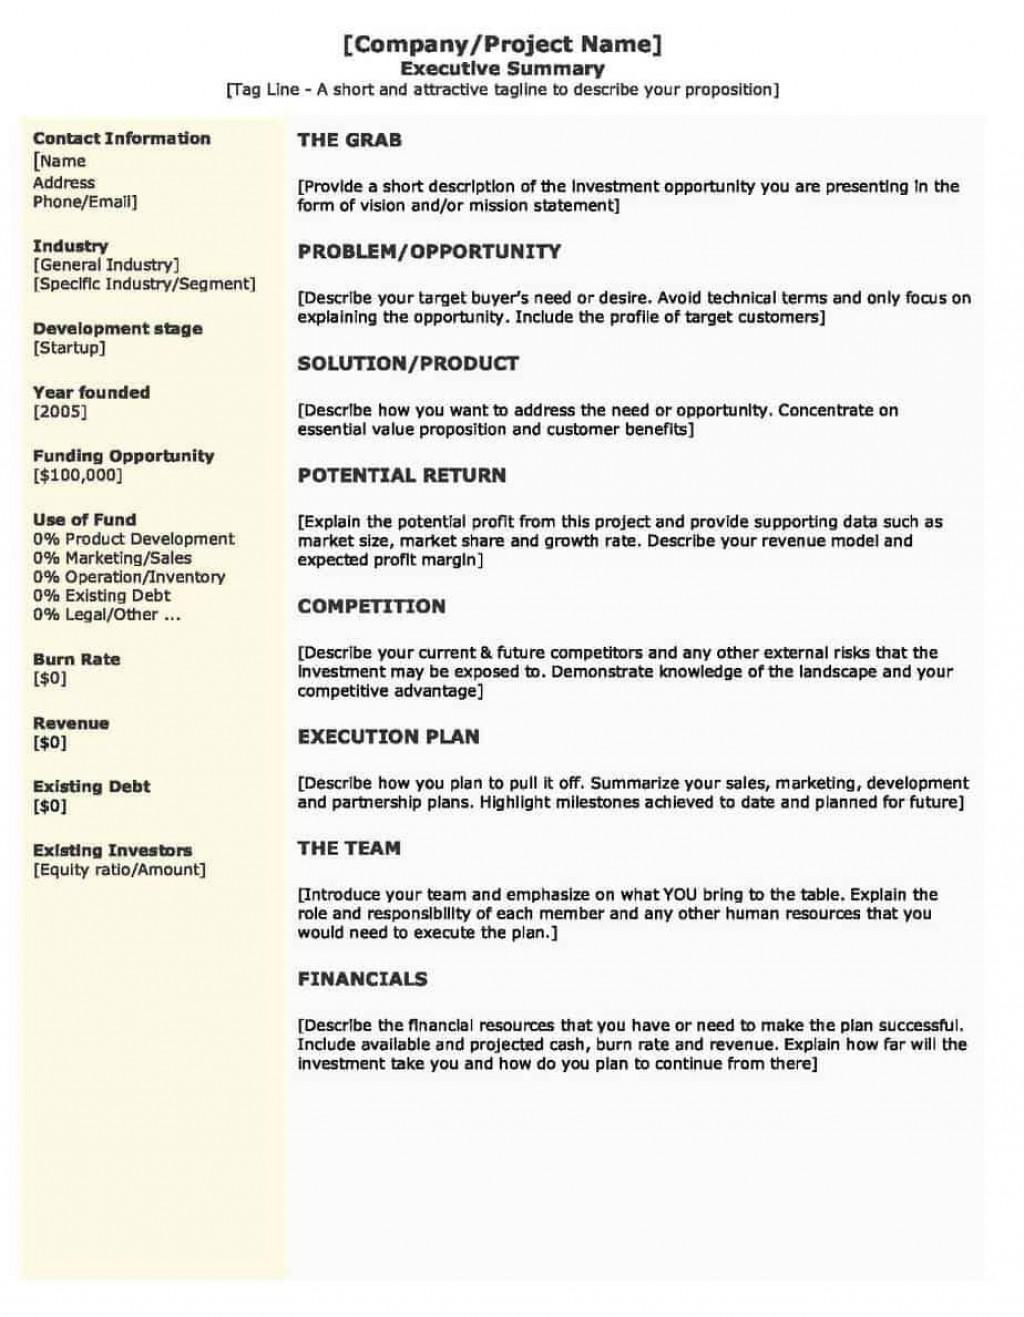 002 Simple Executive Summary Template Doc Photo  Document Example GoogleLarge